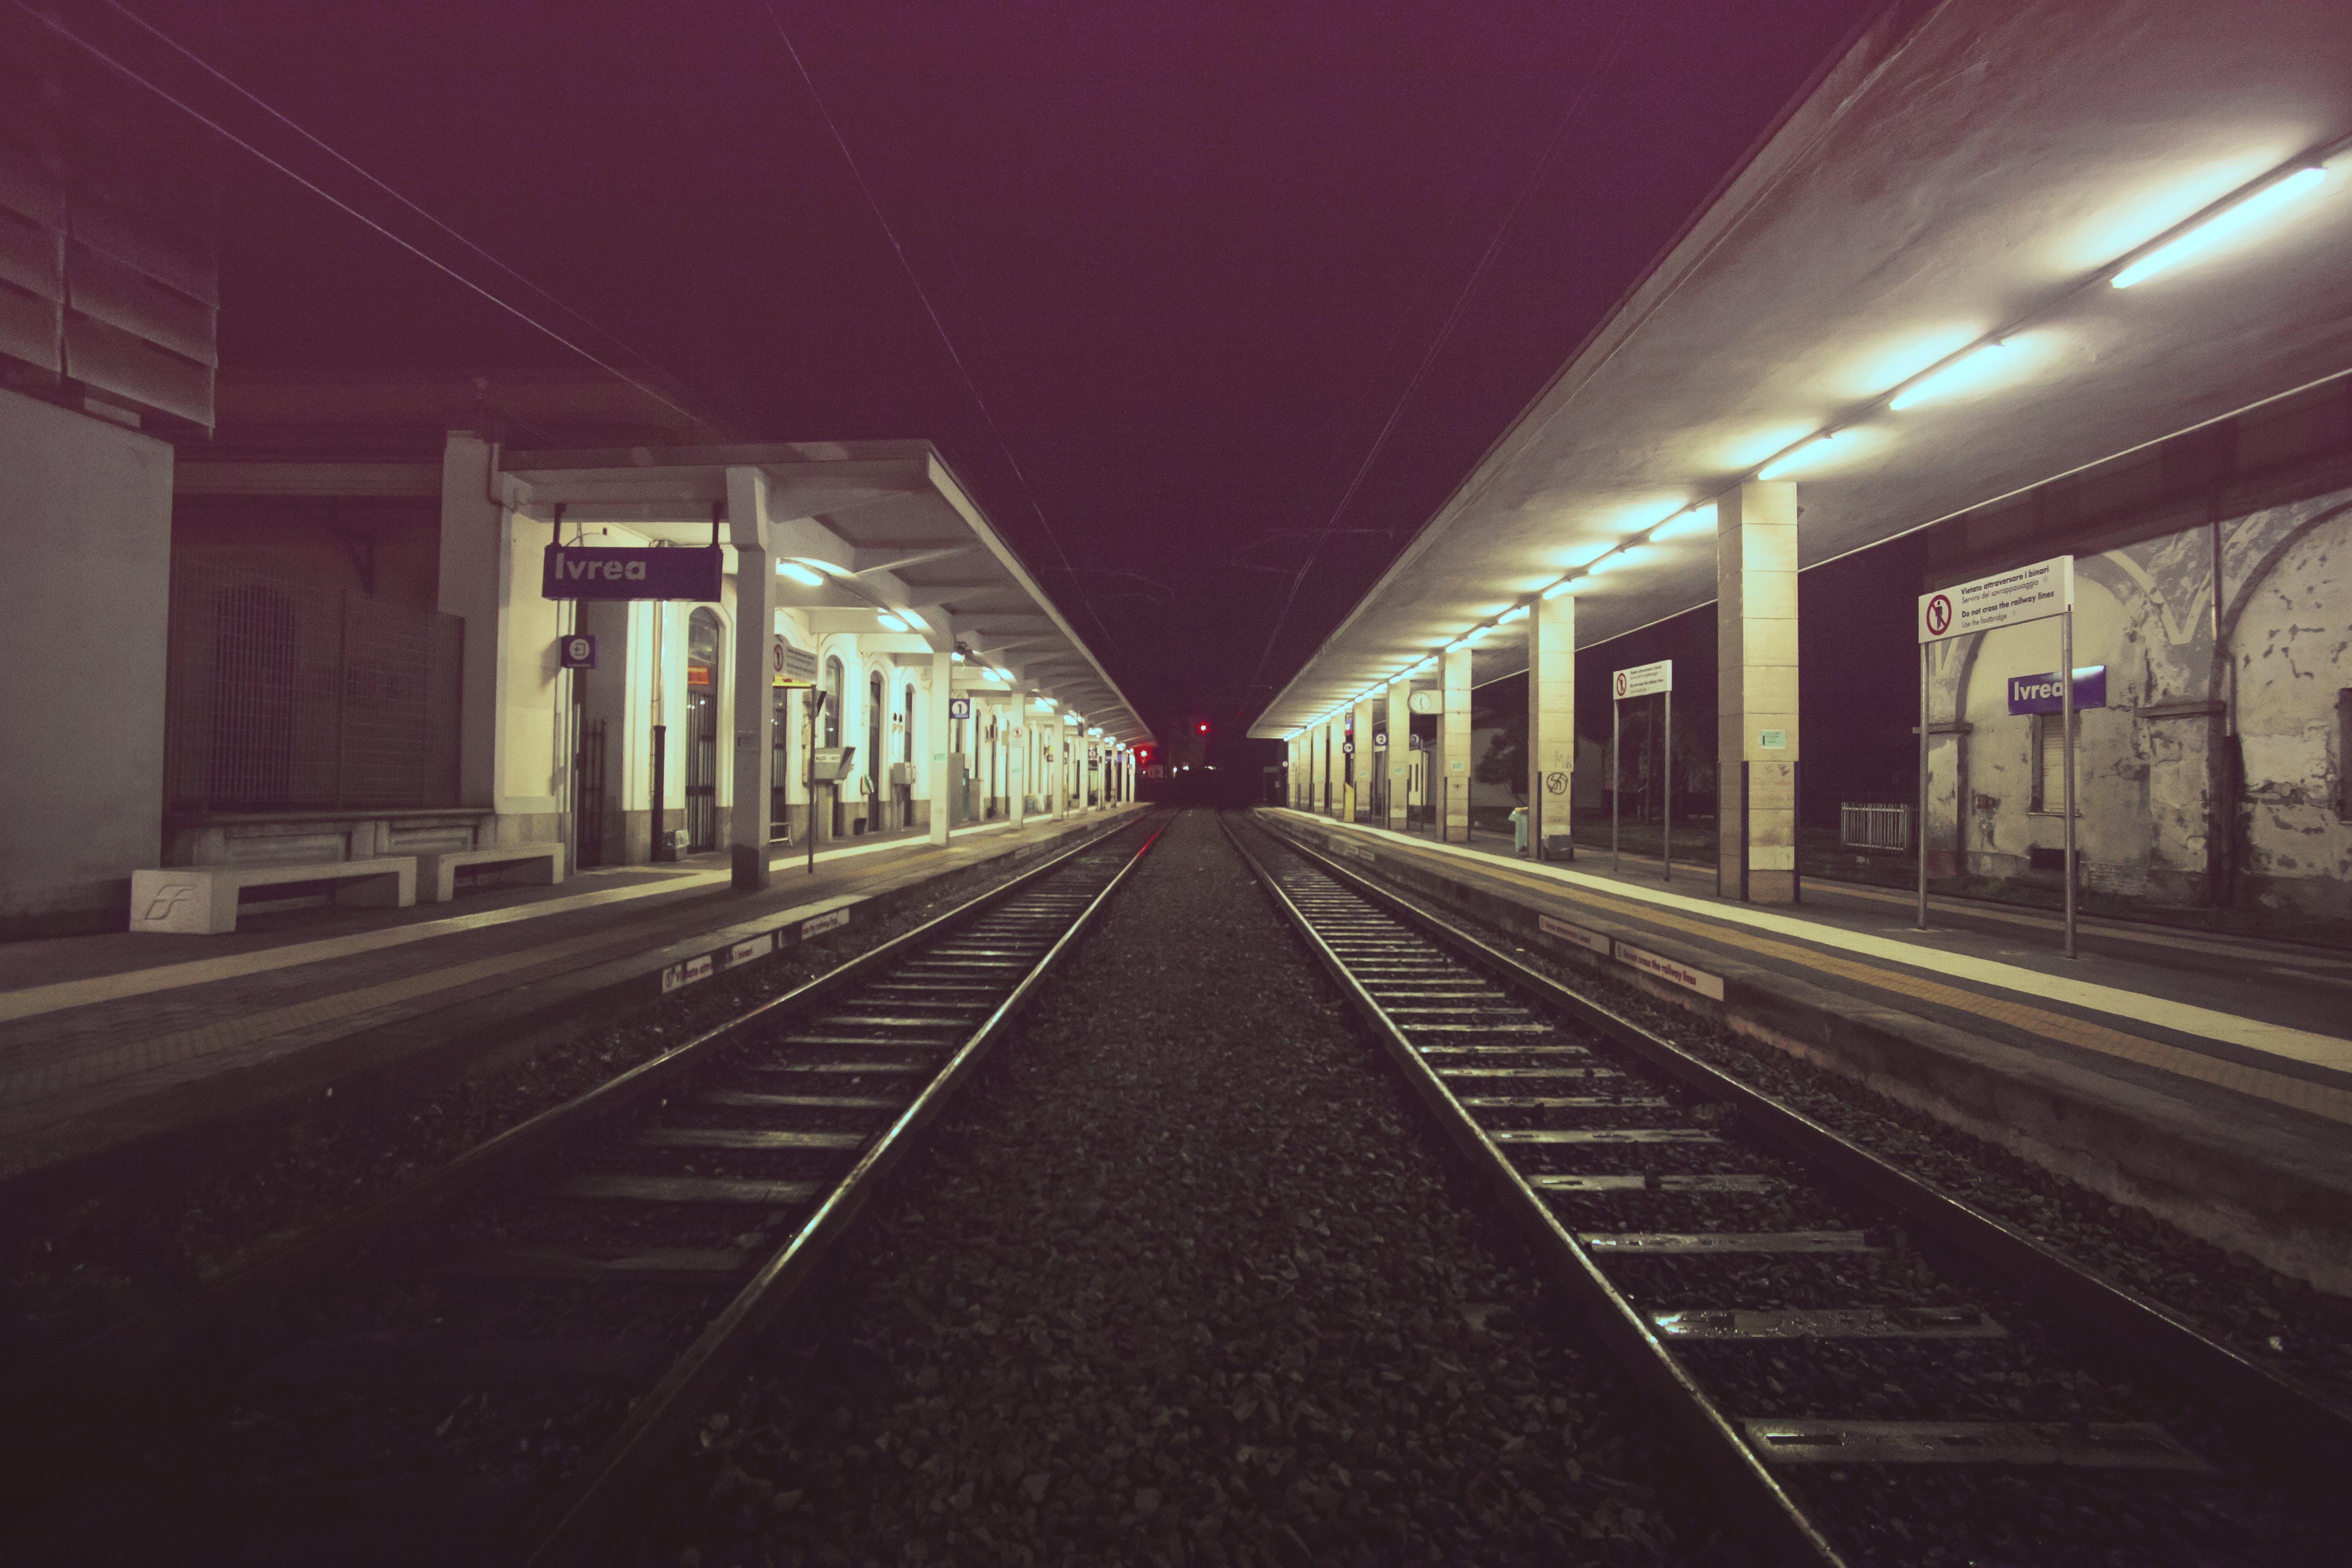 Black Train Railways at Night